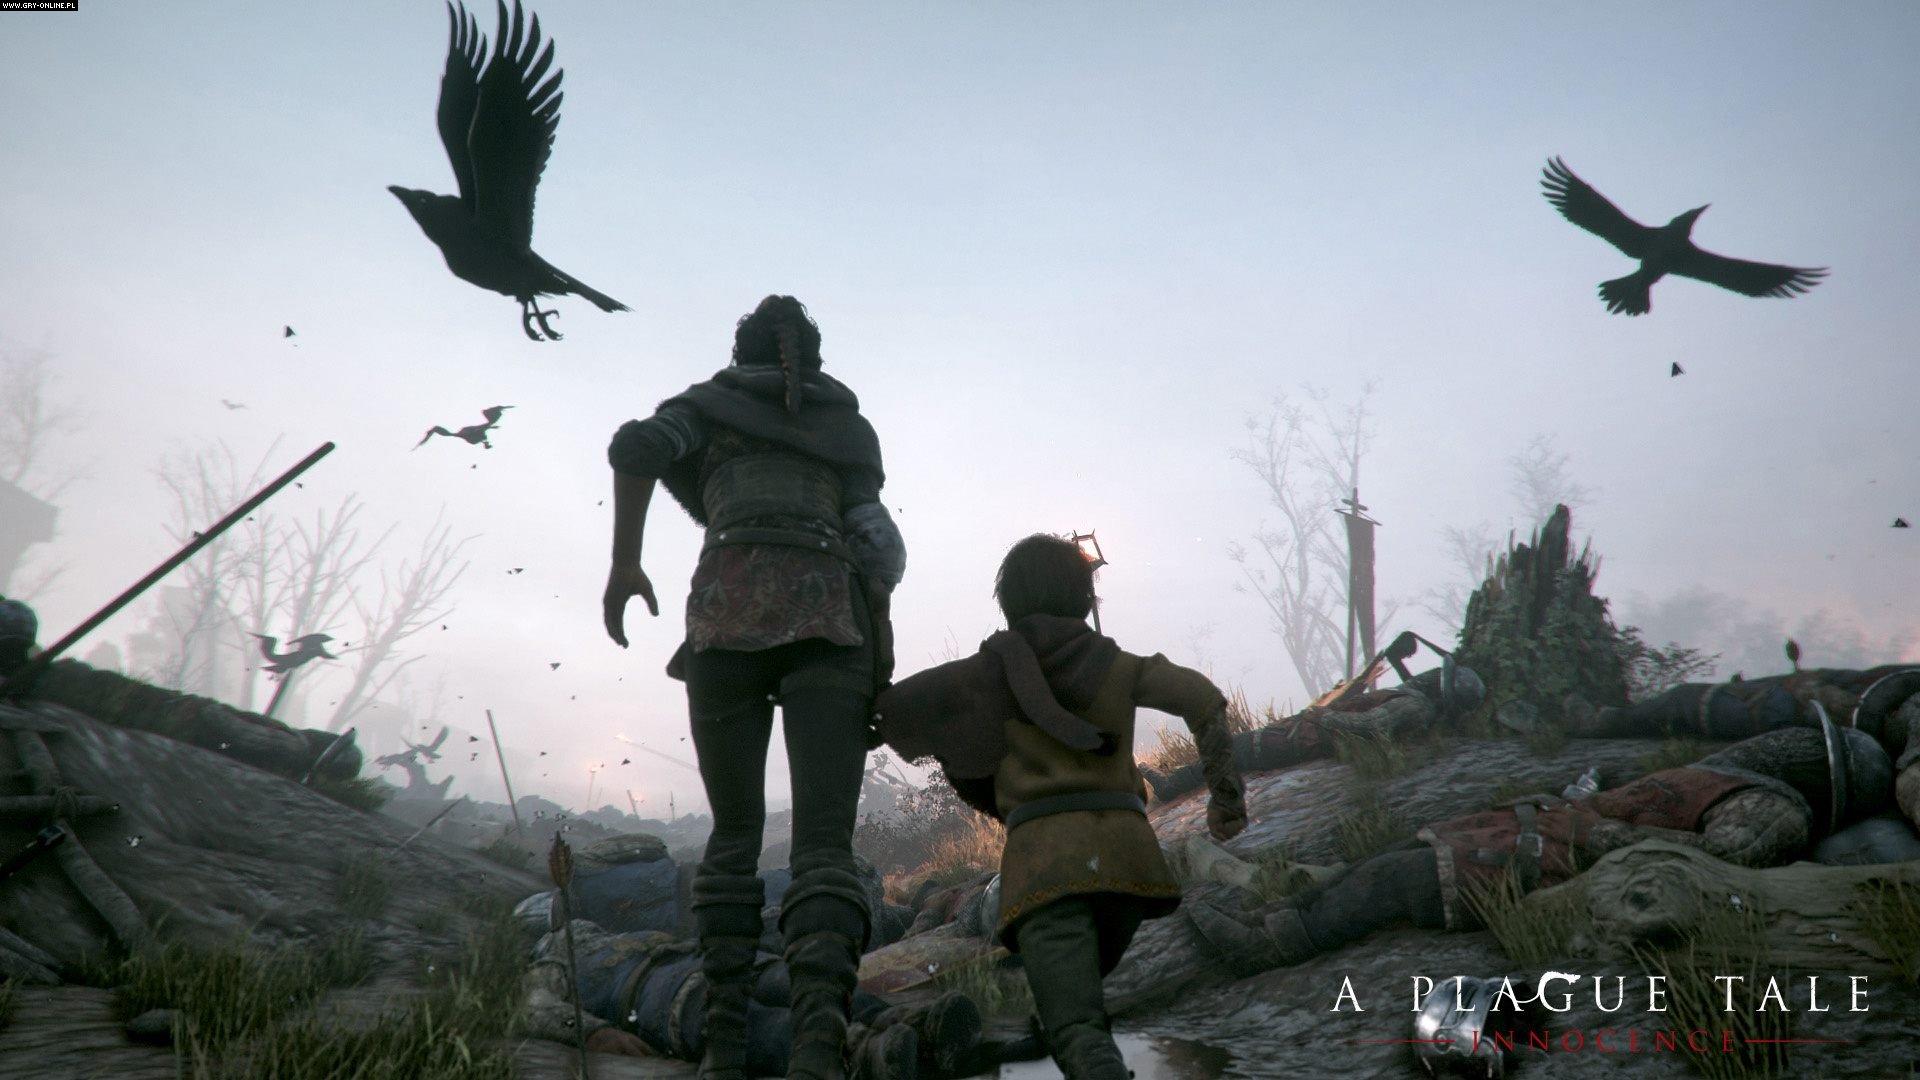 A Plague Tale: Innocence PC, PS4, XONE Games Image 29/30, Asobo Studio, Focus Home Interactive